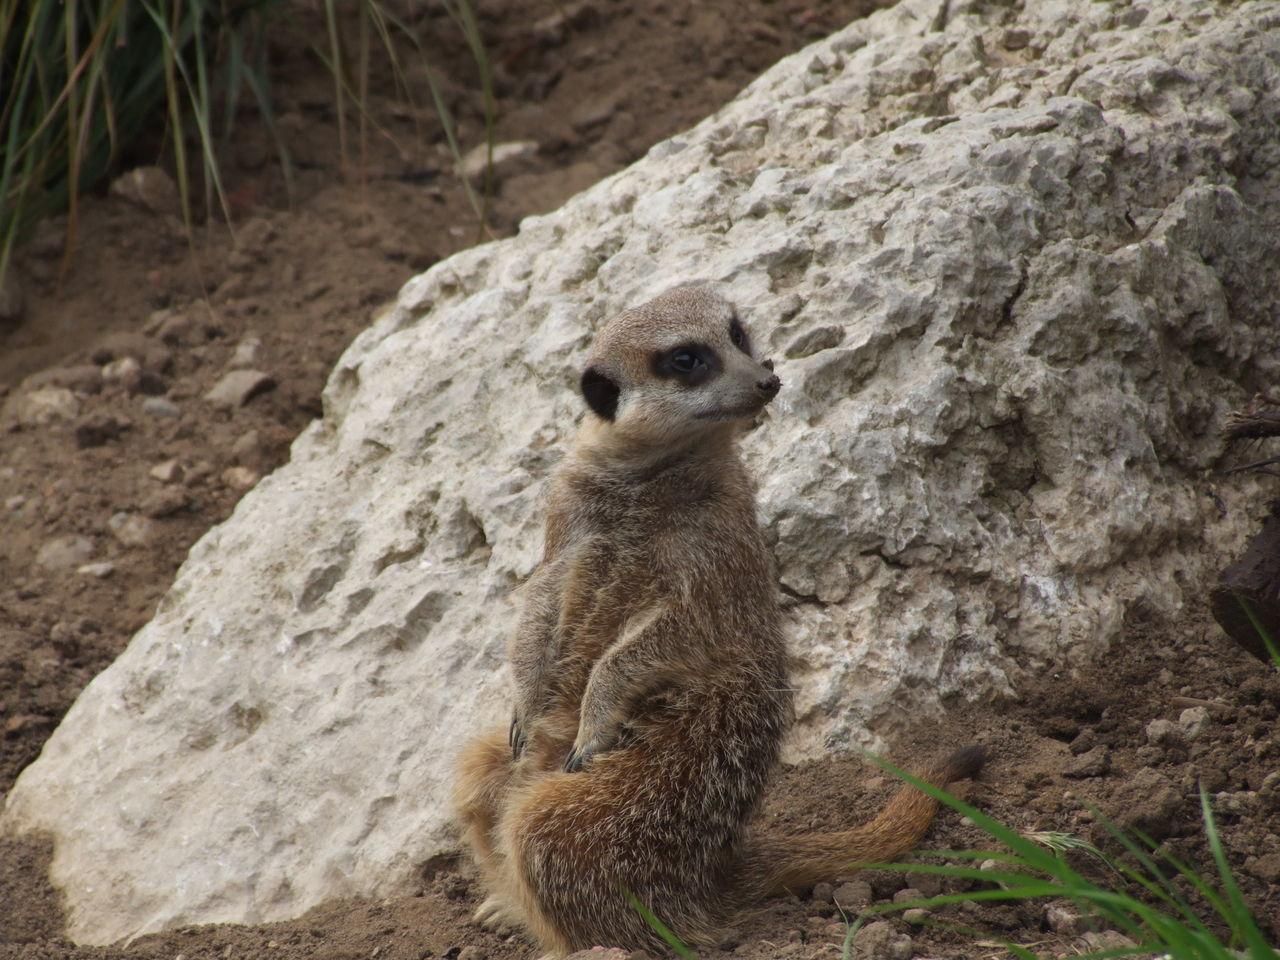 Animal Themes Animal Wildlife Animals In The Wild Day EyeEm Best Shots Mammal Meerkat Nature No People One Animal Outdoors